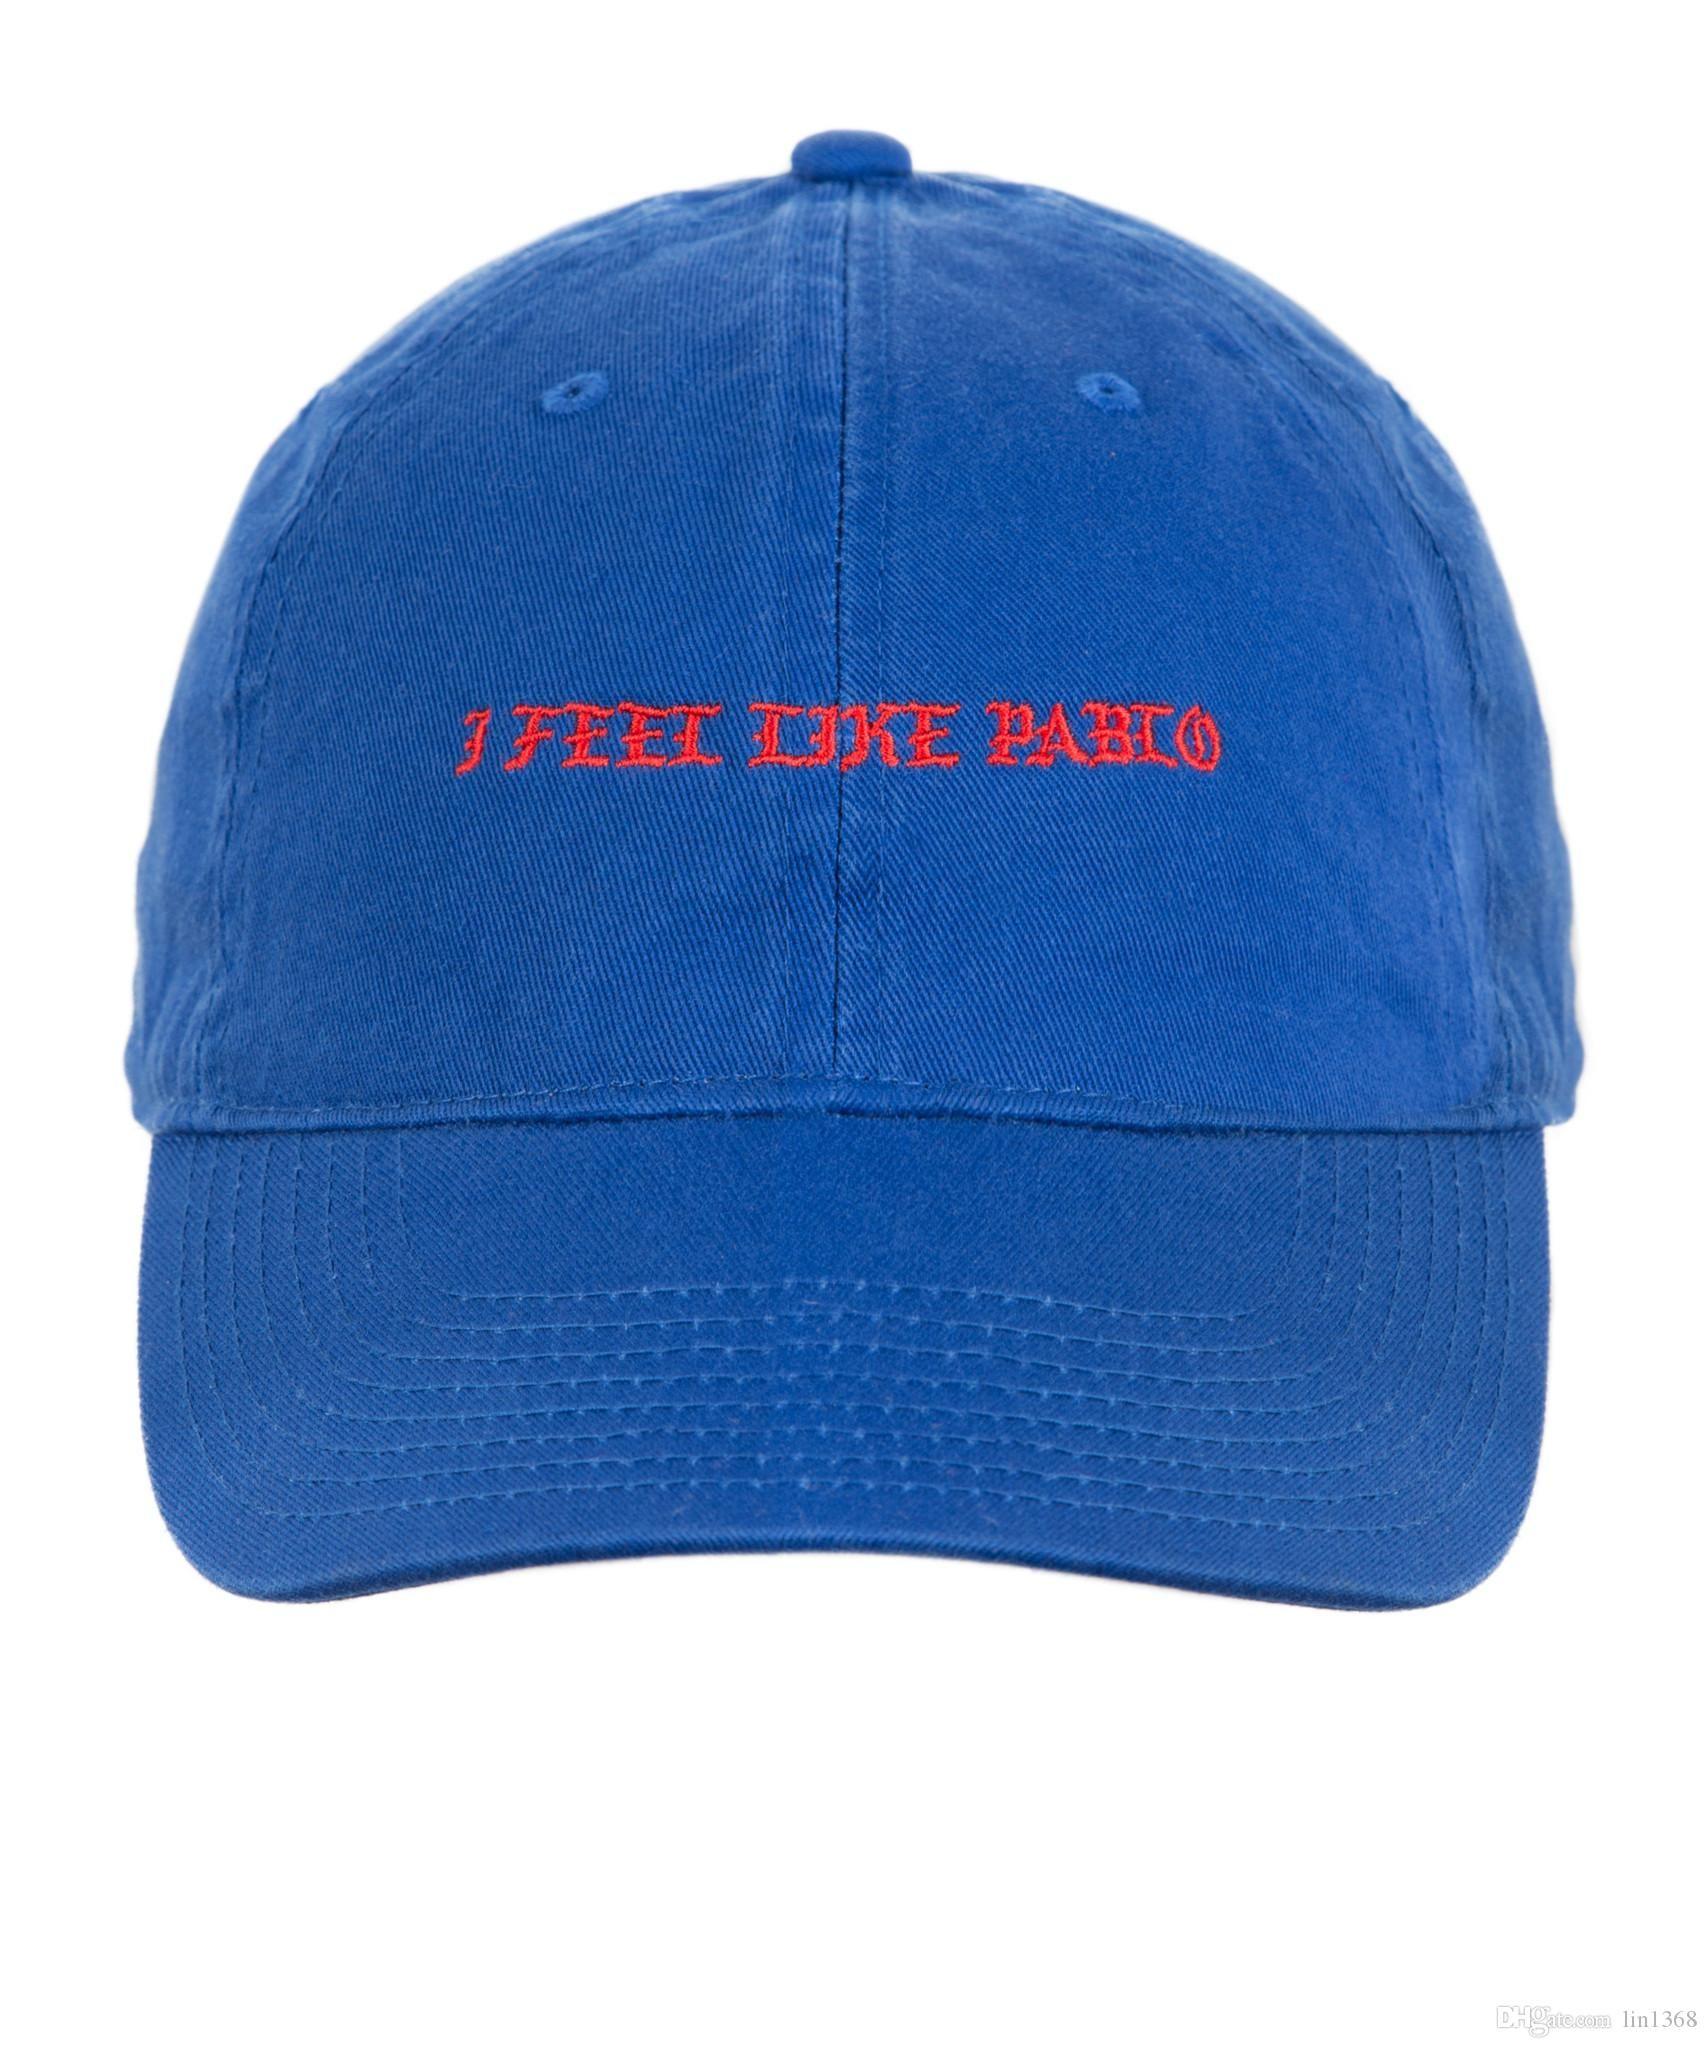 2b175046510 The Life Of Pablo Hat Cap Kanye I Feel Like Pablo Dash TLOP Bear Dad  Snapback Caps 350 750 Flat Bill Hats Baseball Hat From Godhat